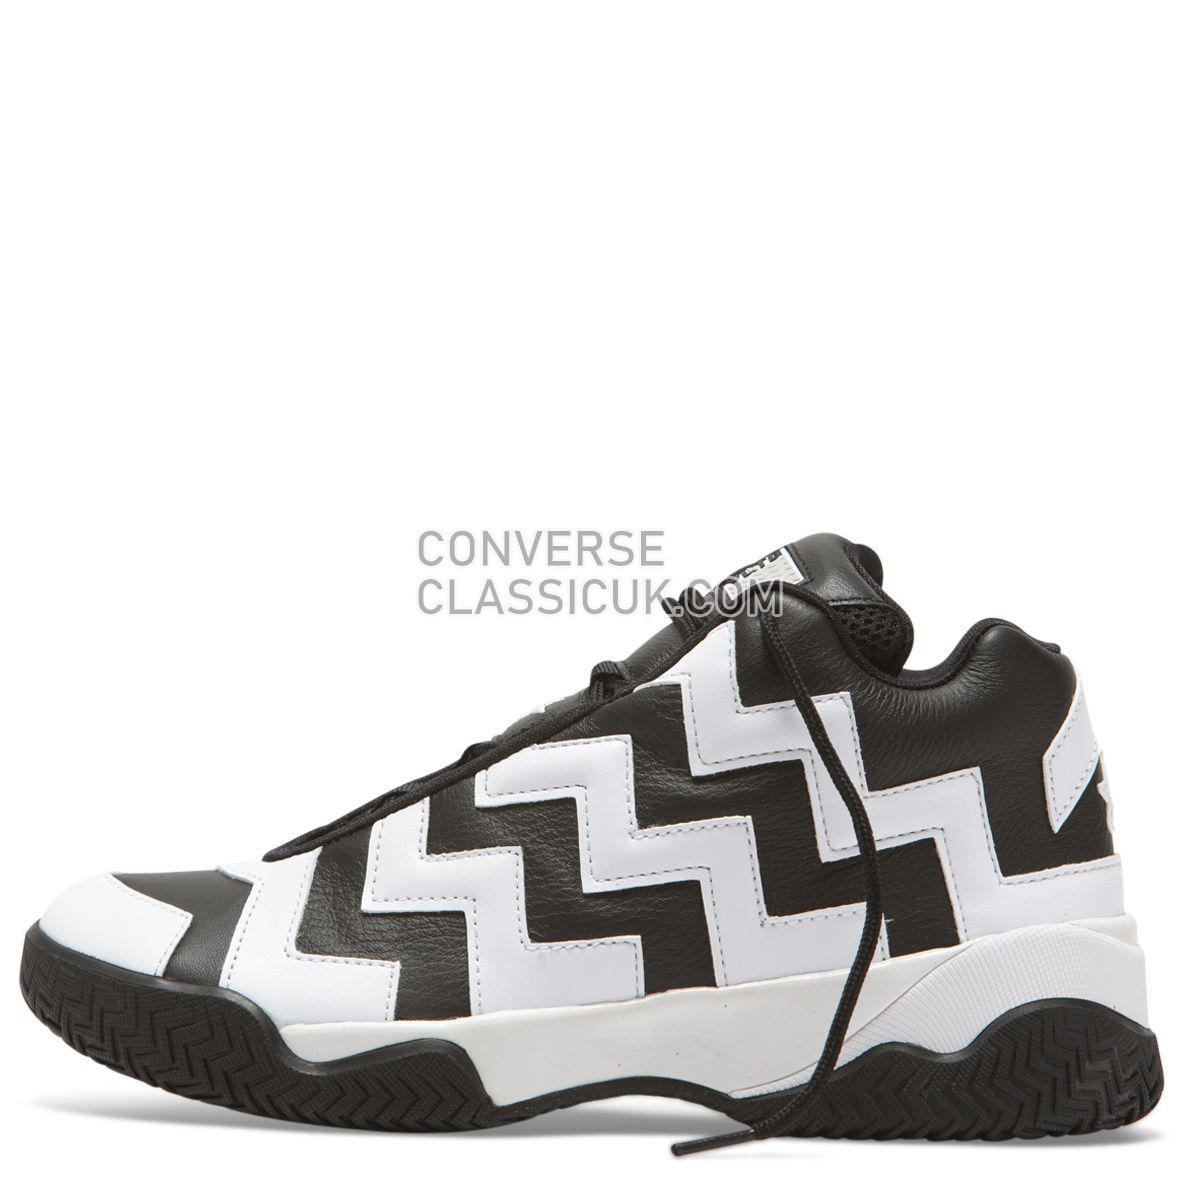 Converse Chuck Taylor All Star VLTG Mission-V Mid Black Womens 565061 Black/White/Black Shoes